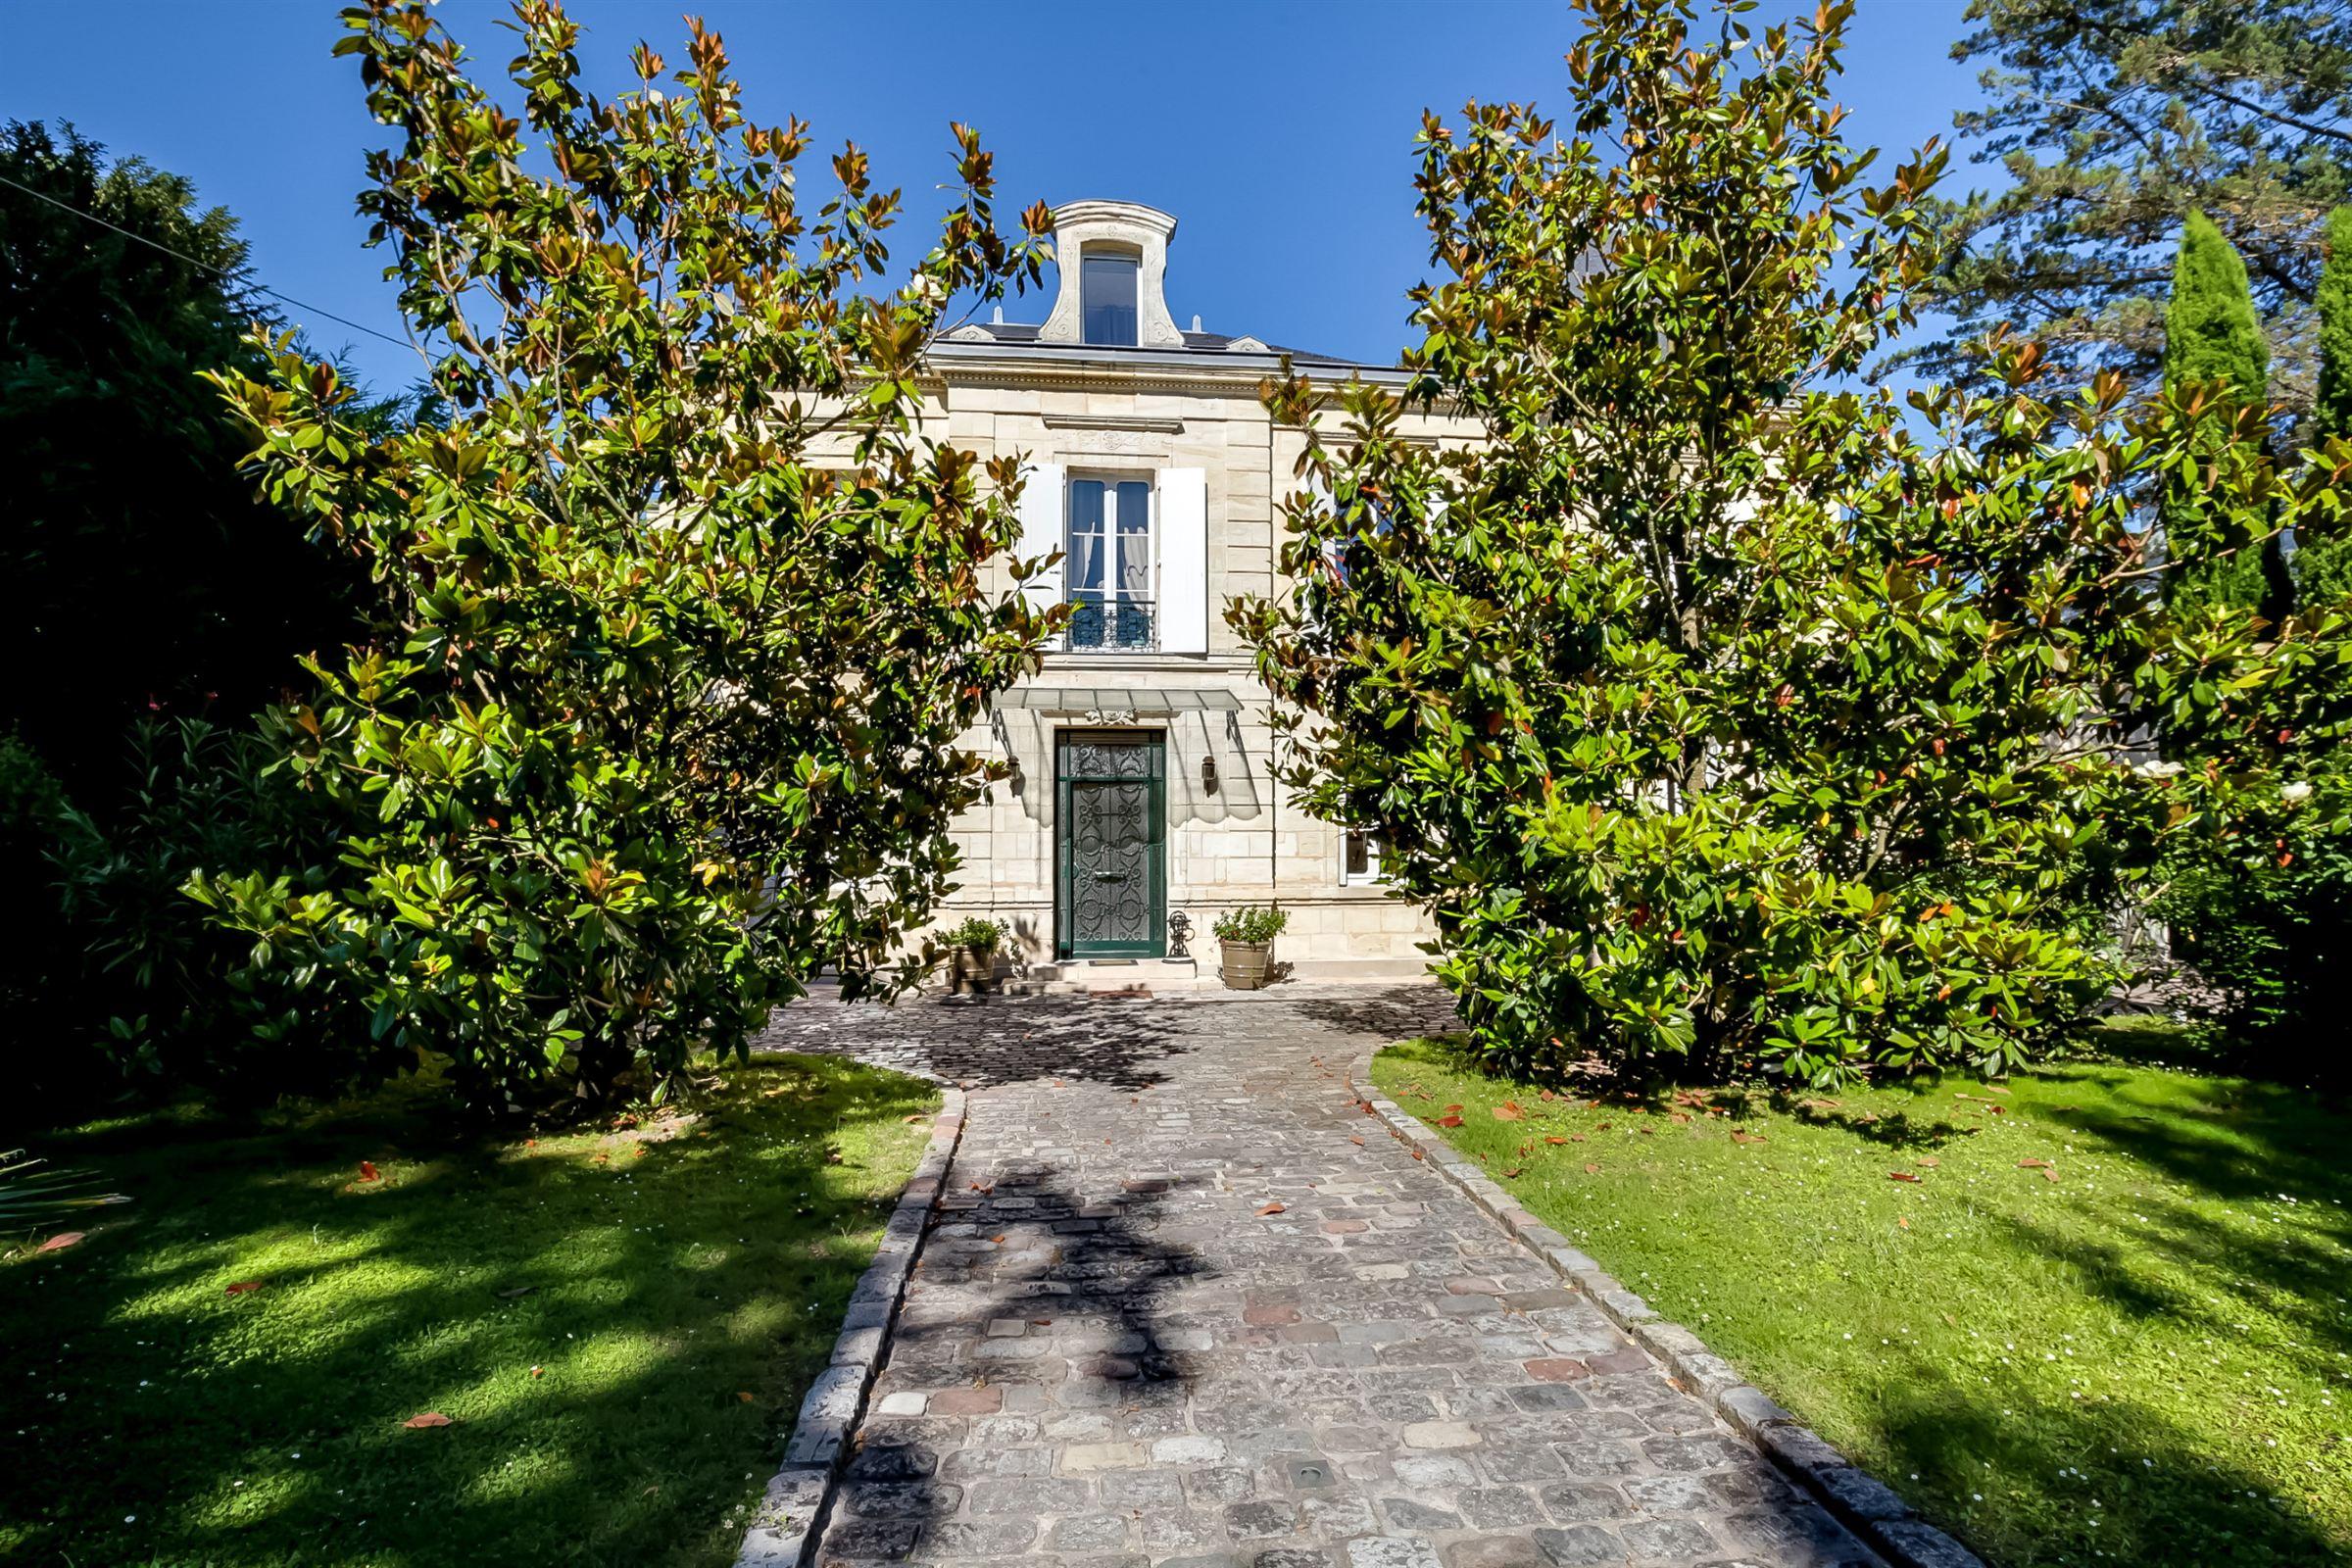 sales property at BORDEAUX BOUSCAT - SUPERB STONE MASTER HOUSE ON A 2300 M² GARDEN : RARE!